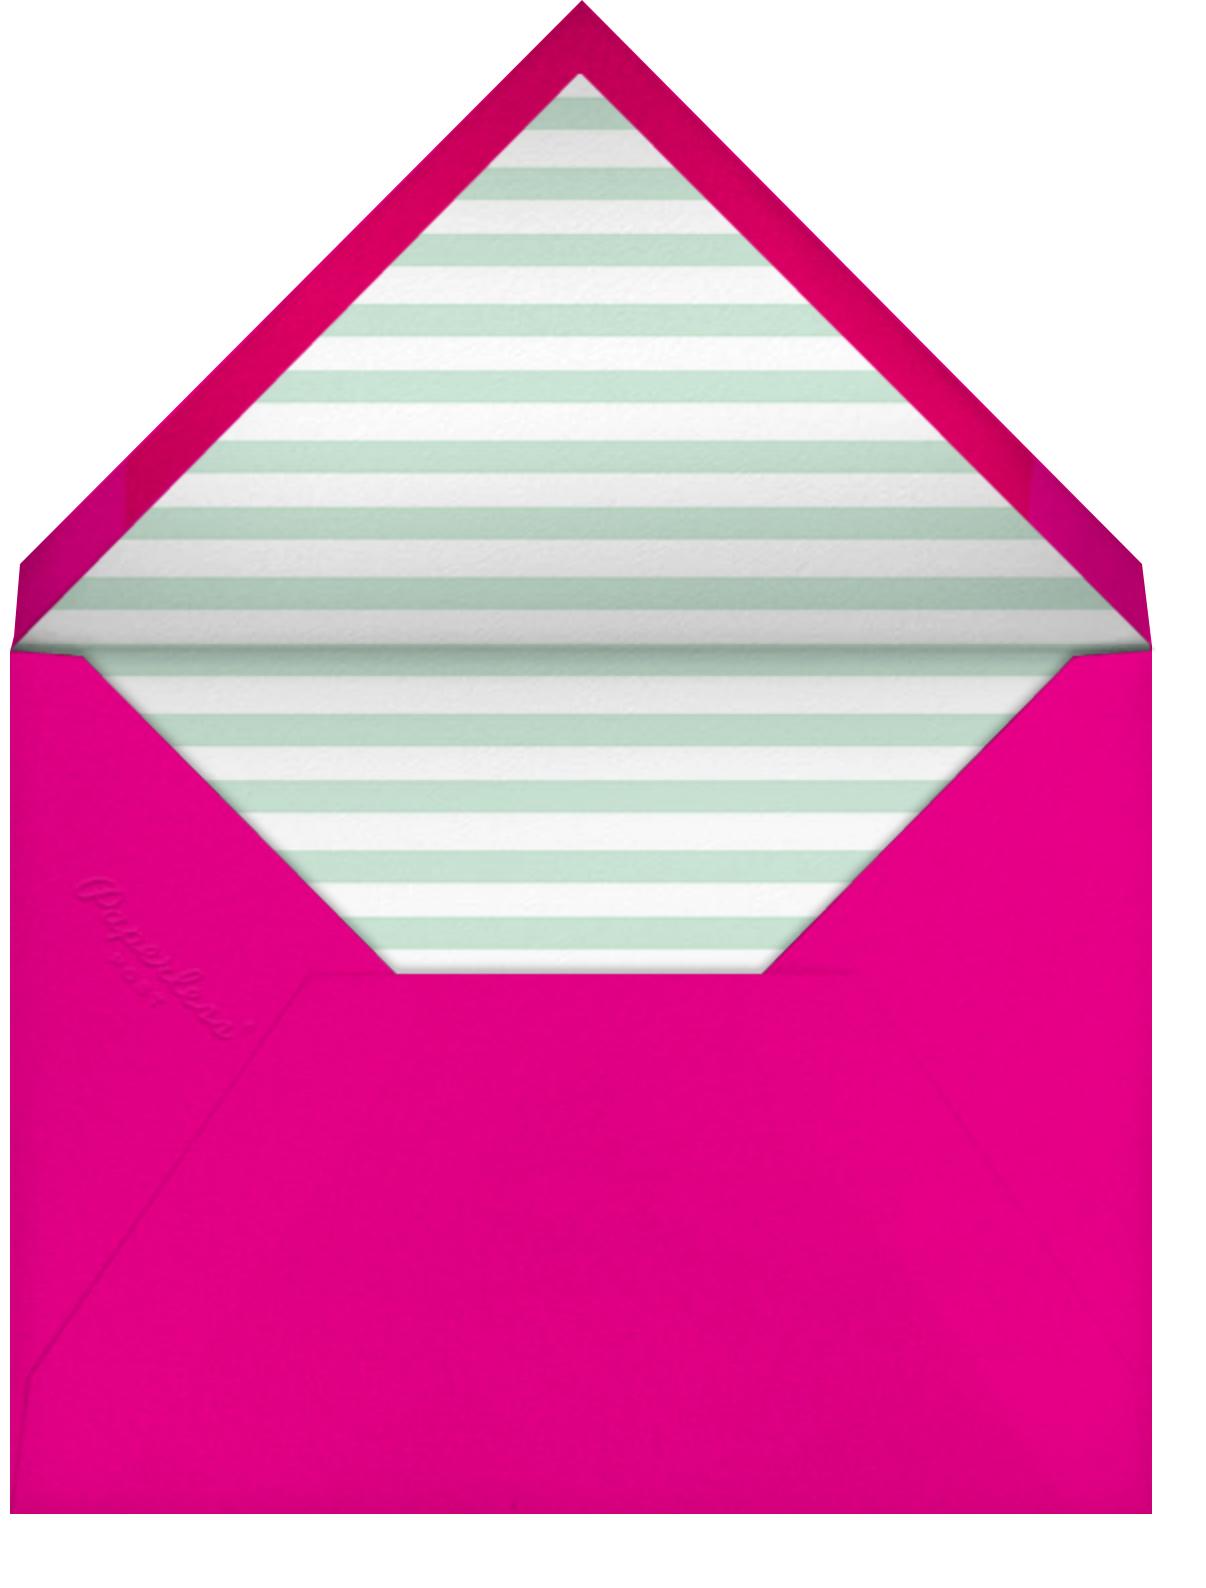 A Bear in the Tent - Pink - Mr. Boddington's Studio - Kids' birthday - envelope back